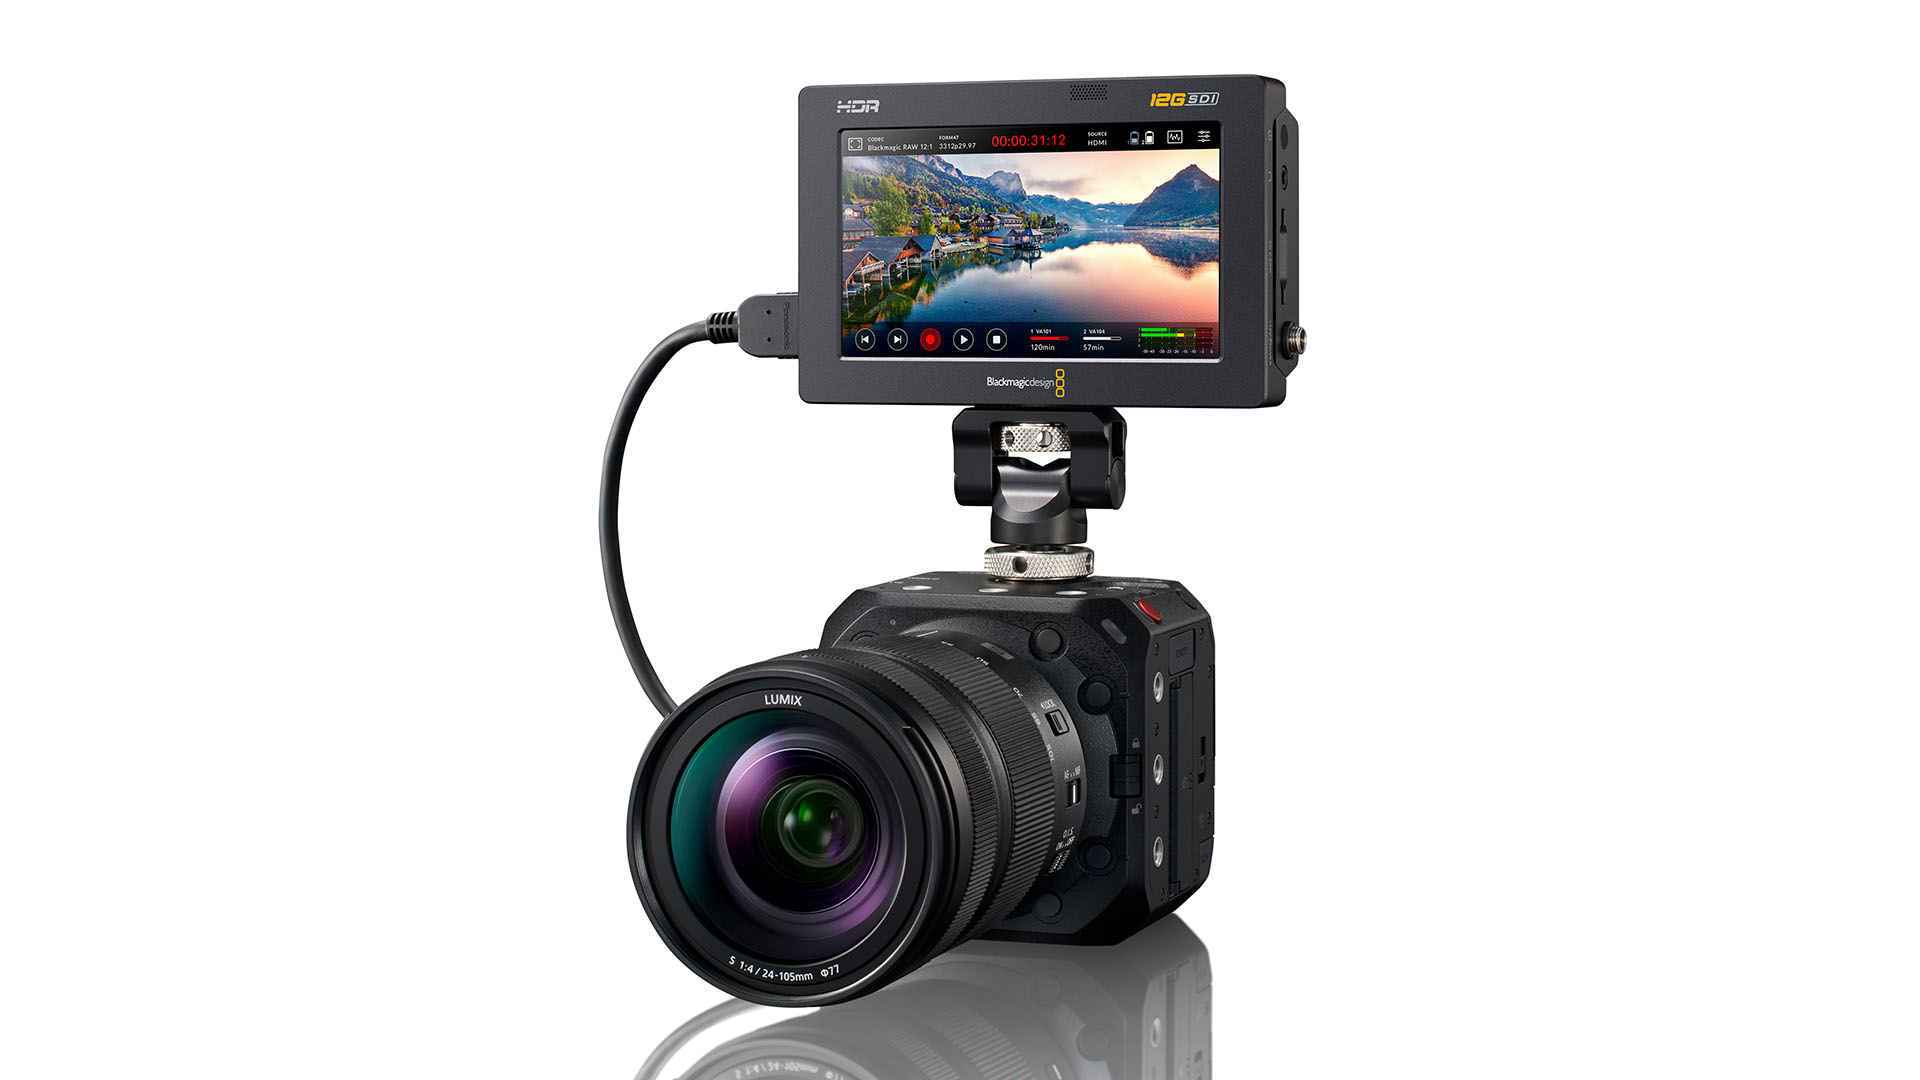 The new full-frame Panasonic LUMIX BS1H box-camera. Image: Panasonic.